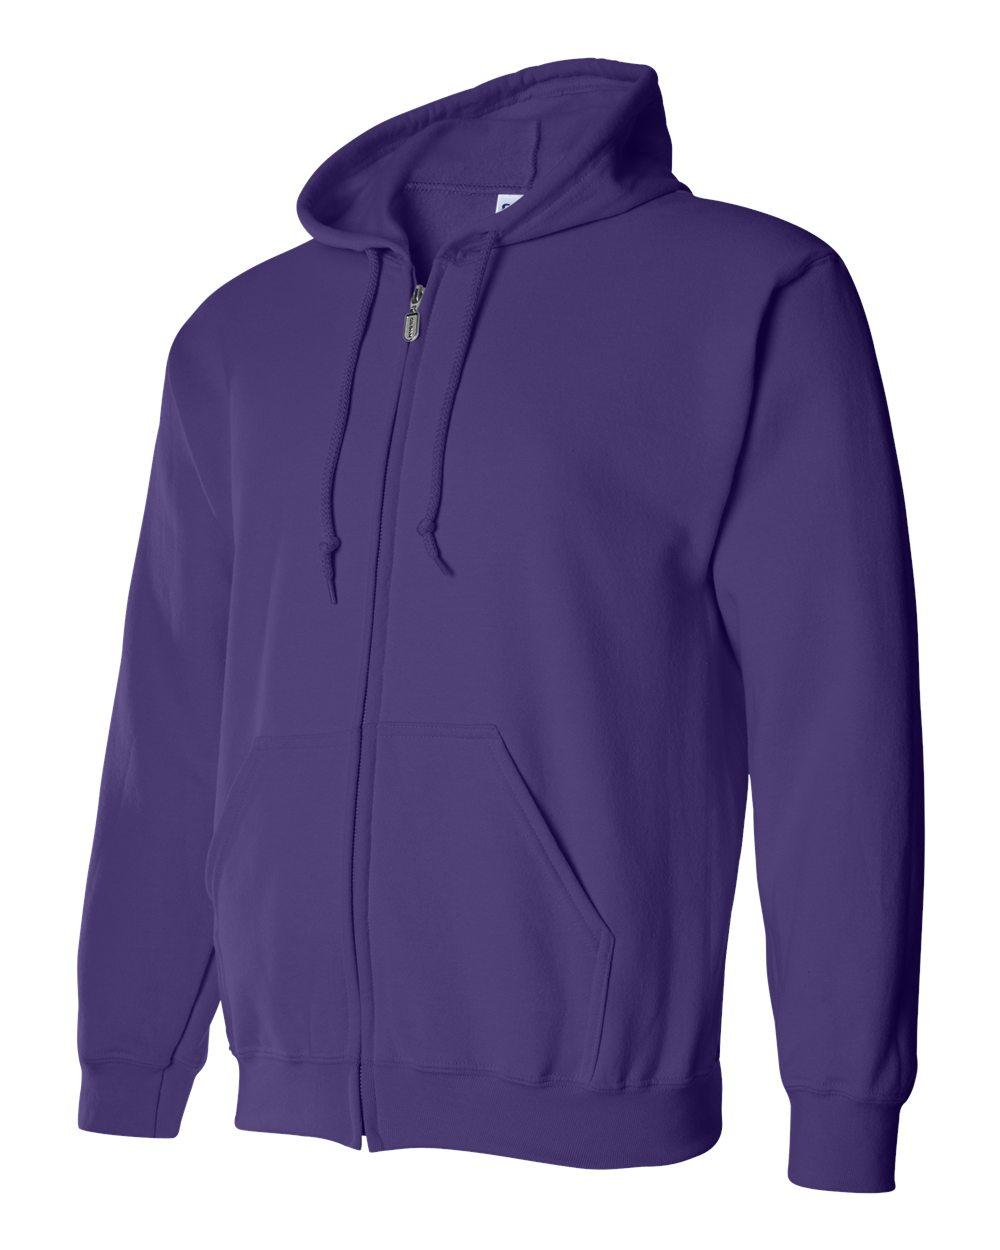 GIL18600 Purple